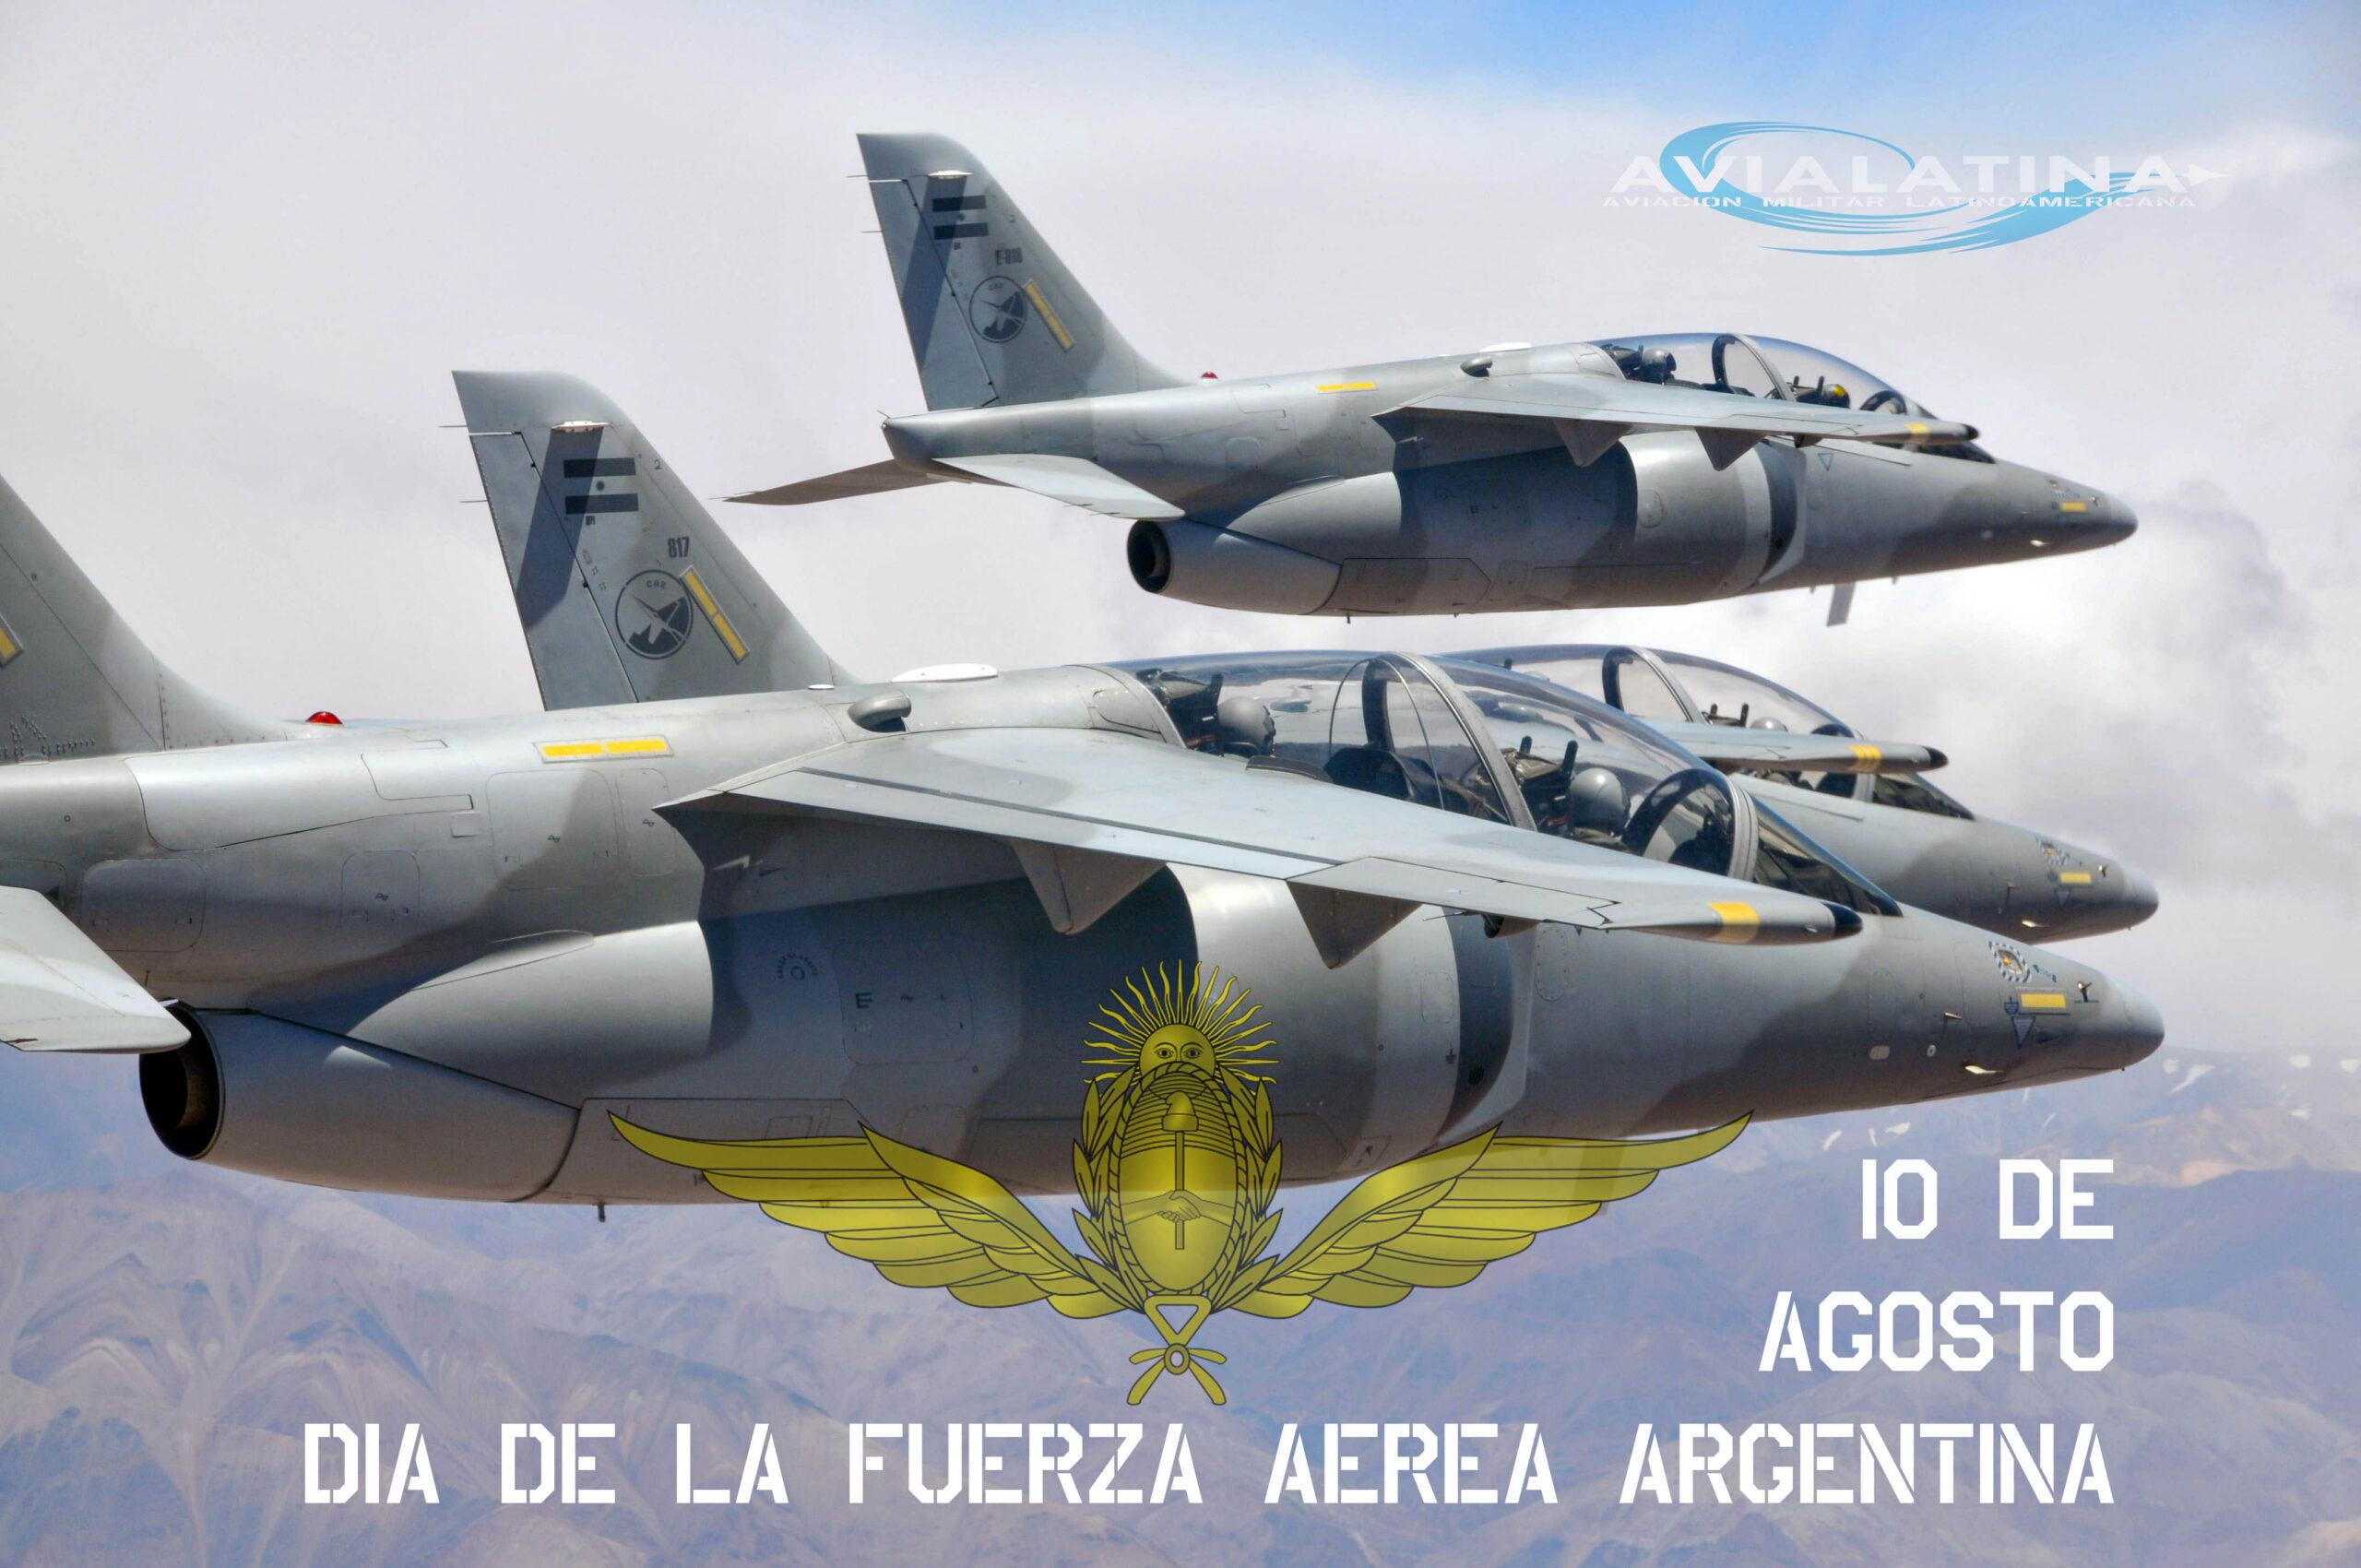 Día de la Fuerza Aérea Argentina – El despliegue a la I Brigada Aérea.